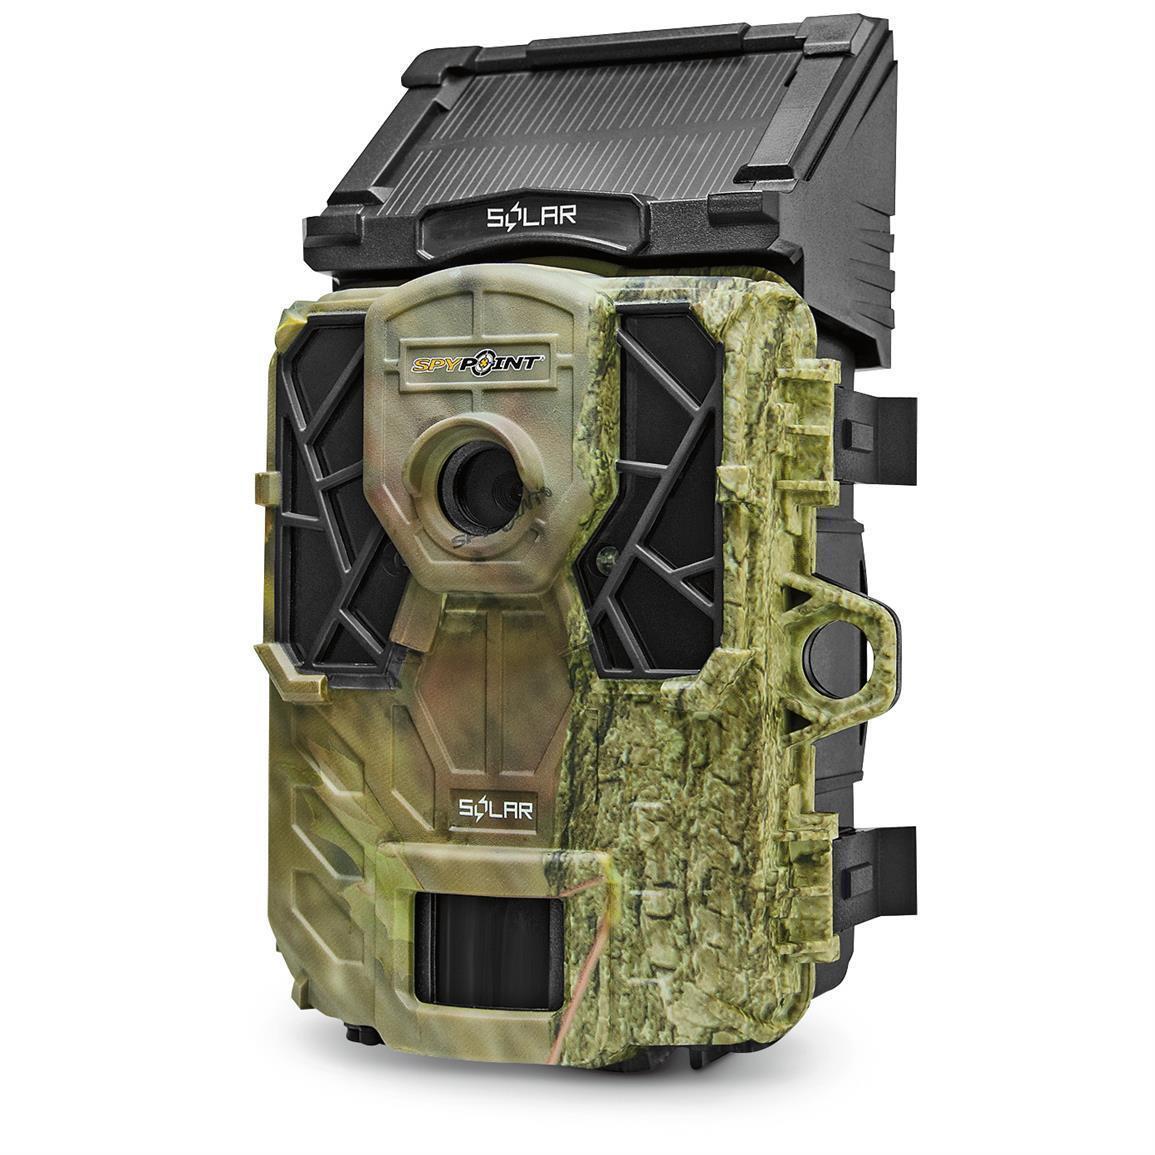 SpyPoint Solar Trail 12MP Camera - Camouflage | eBay